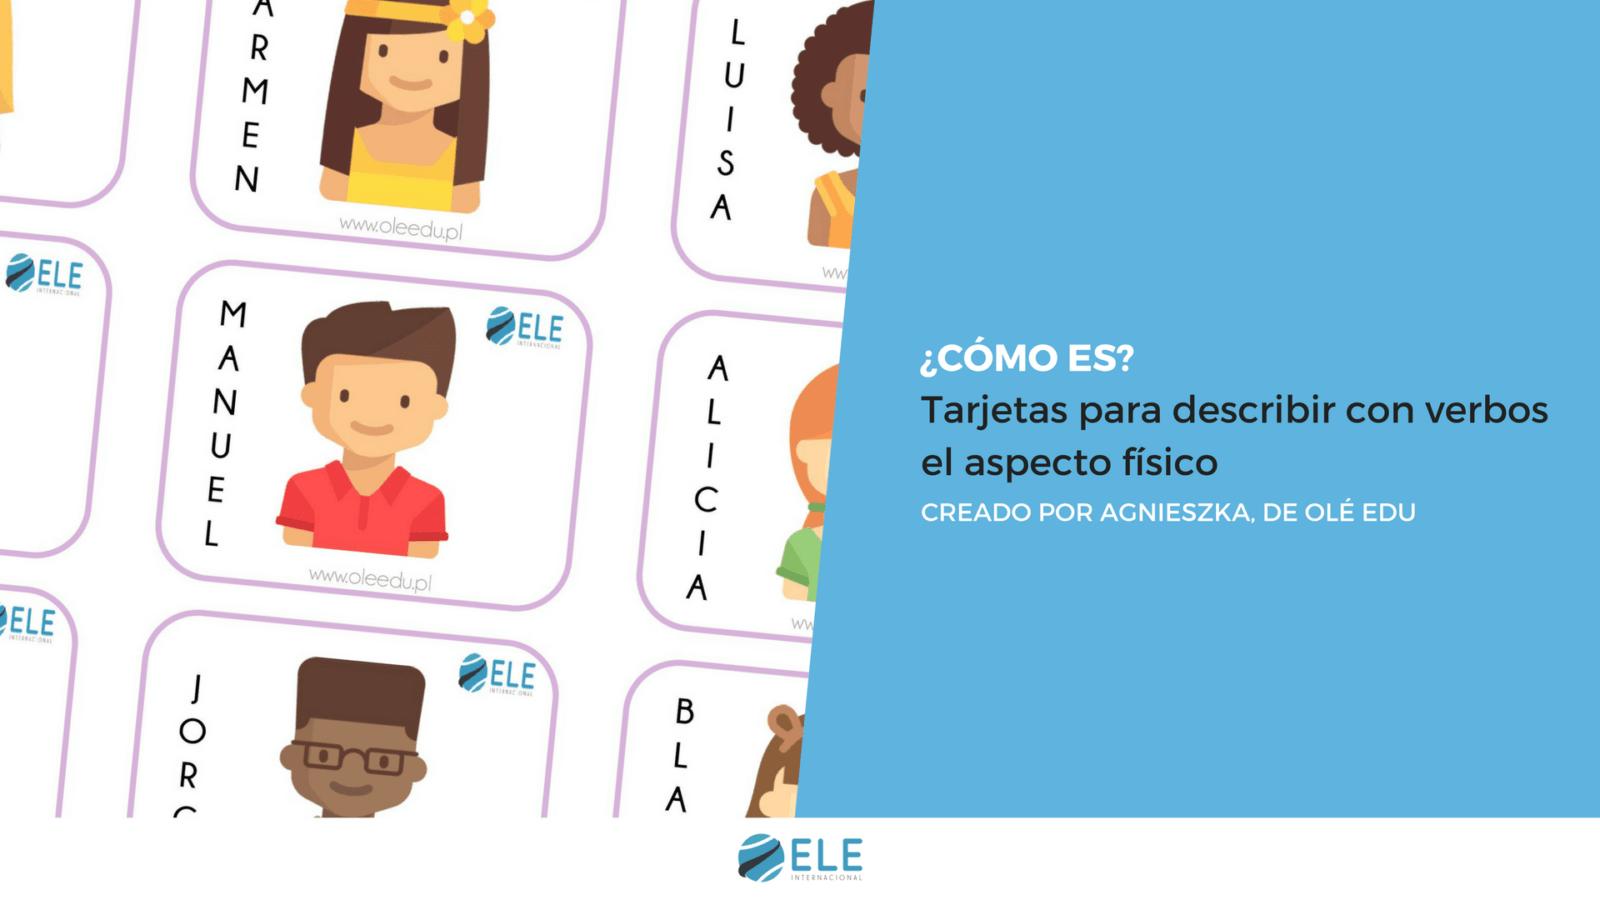 Juegos para practicar descripciones físicas. Cartas para aprender a describir en clase de ELE. #spanishteacher #profedeele